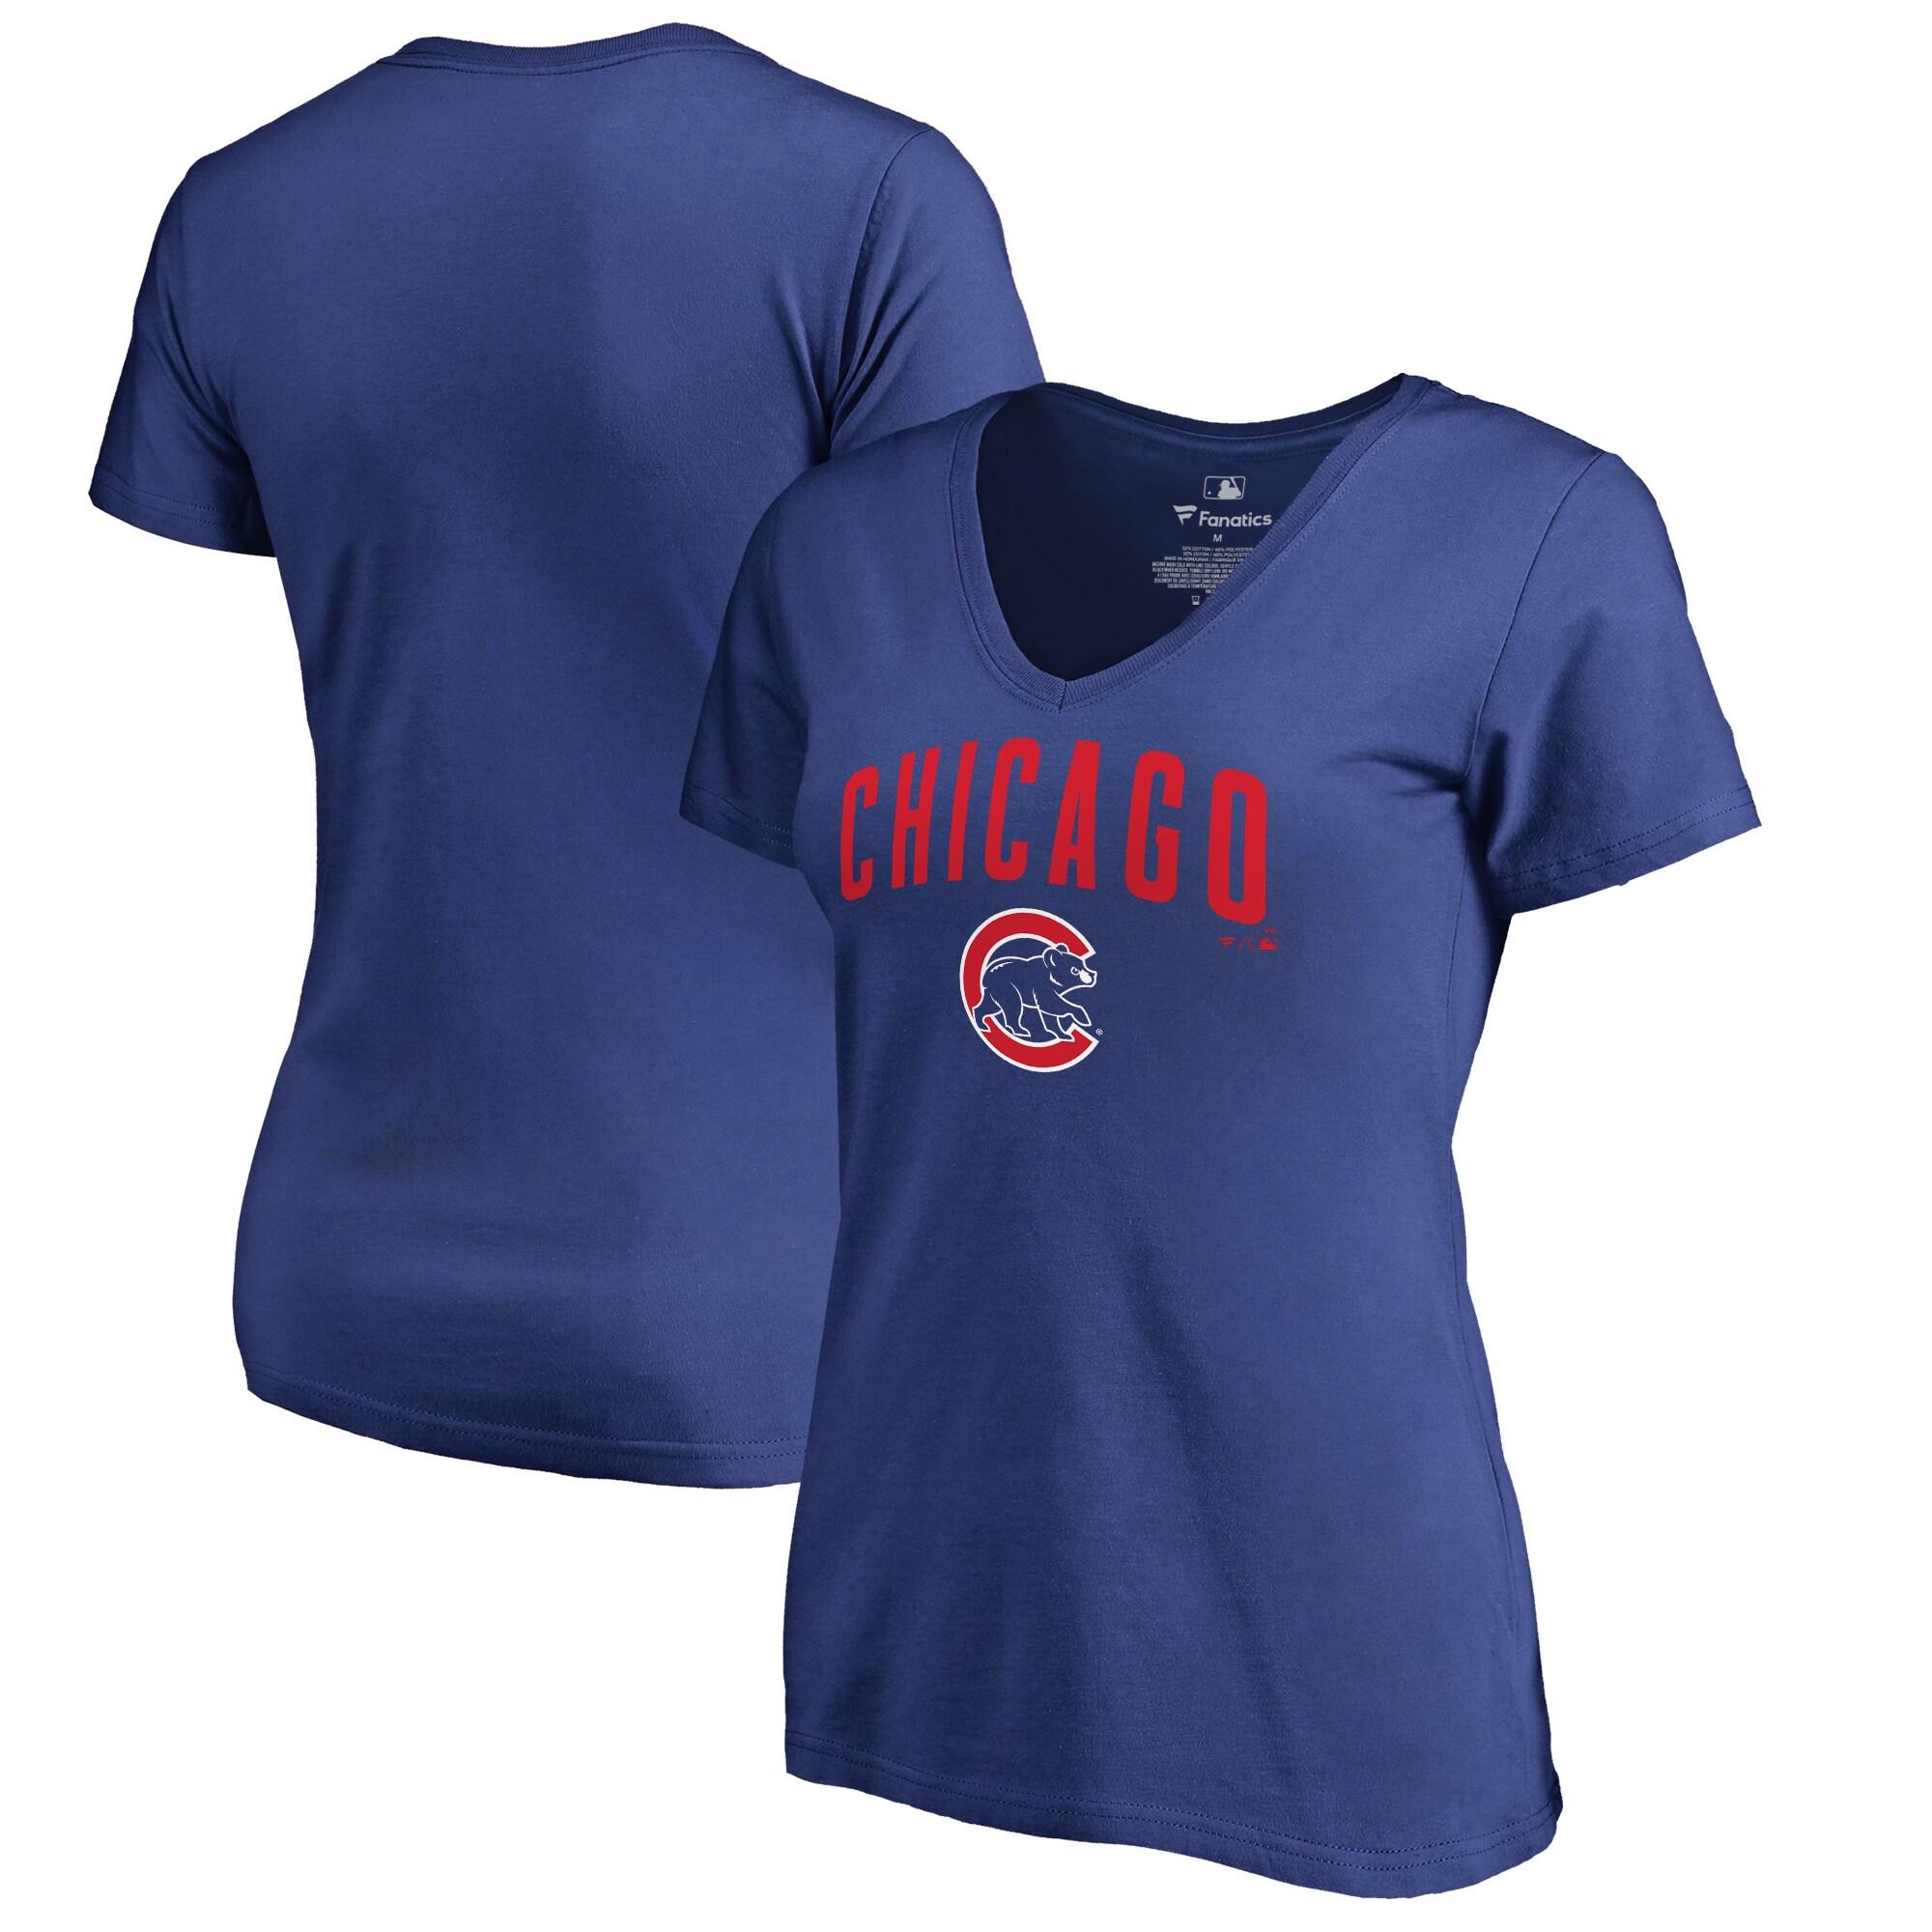 Chicago Cubs Fanatics Branded Women's Team Lockup V-Neck T-Shirt - Royal